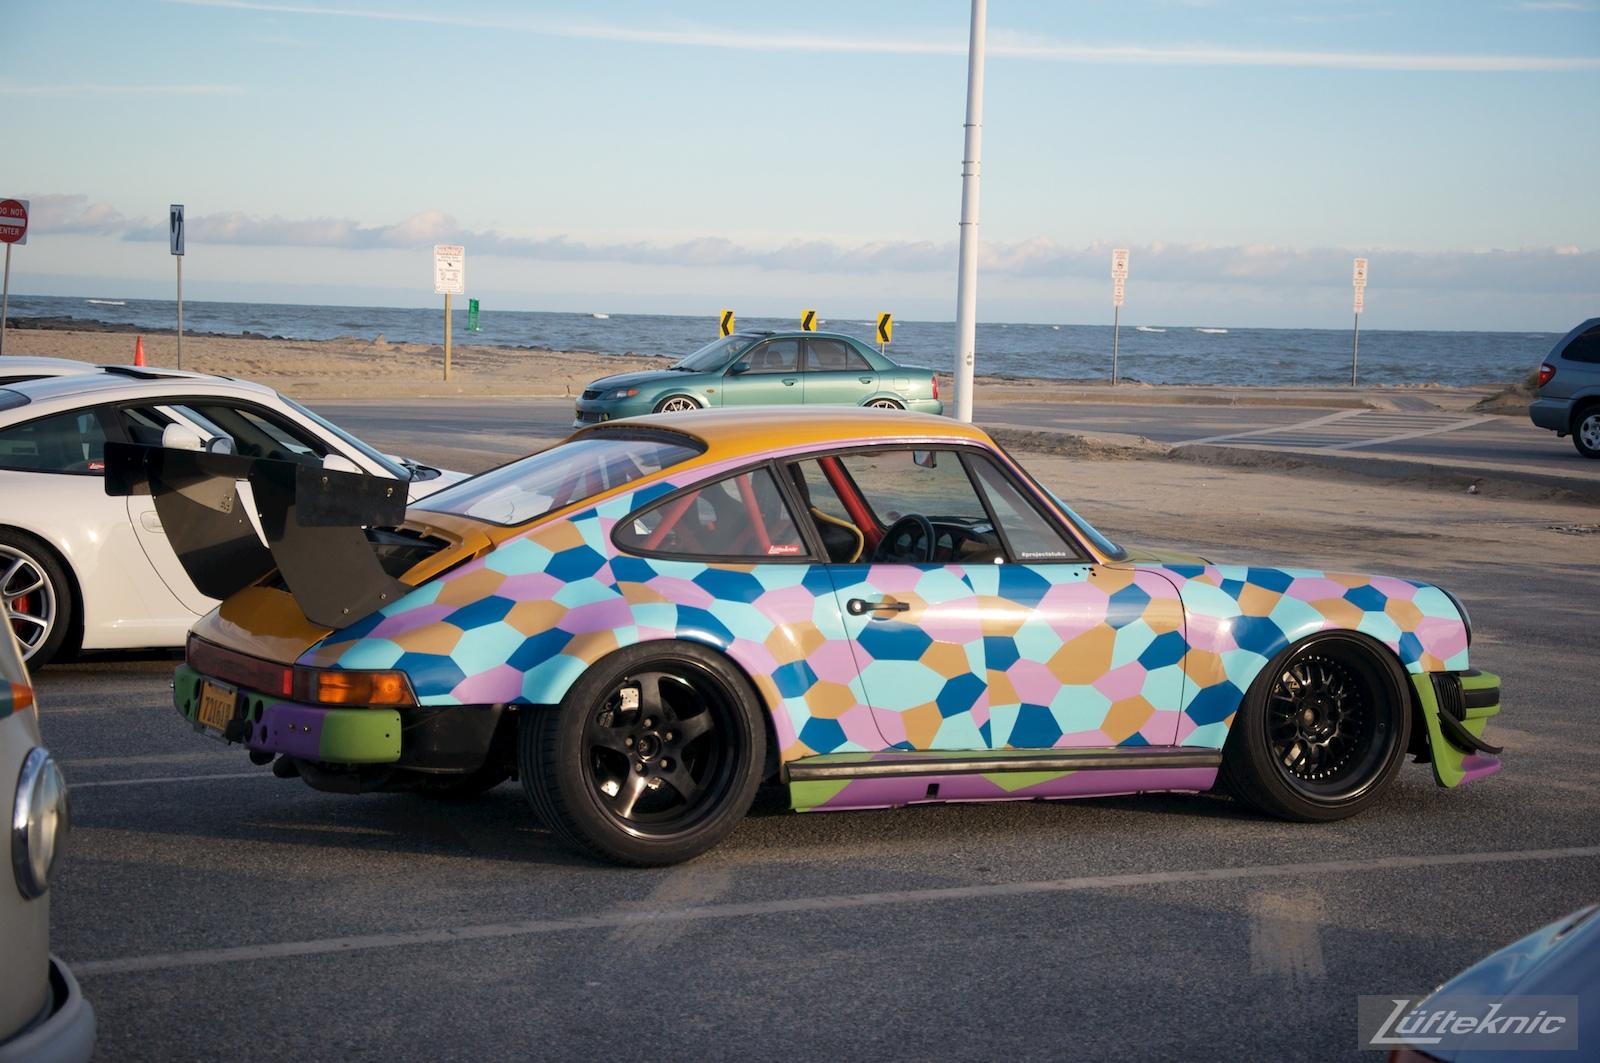 Lüfteknic #projectstuka Porsche 930 Turbo flank shot.